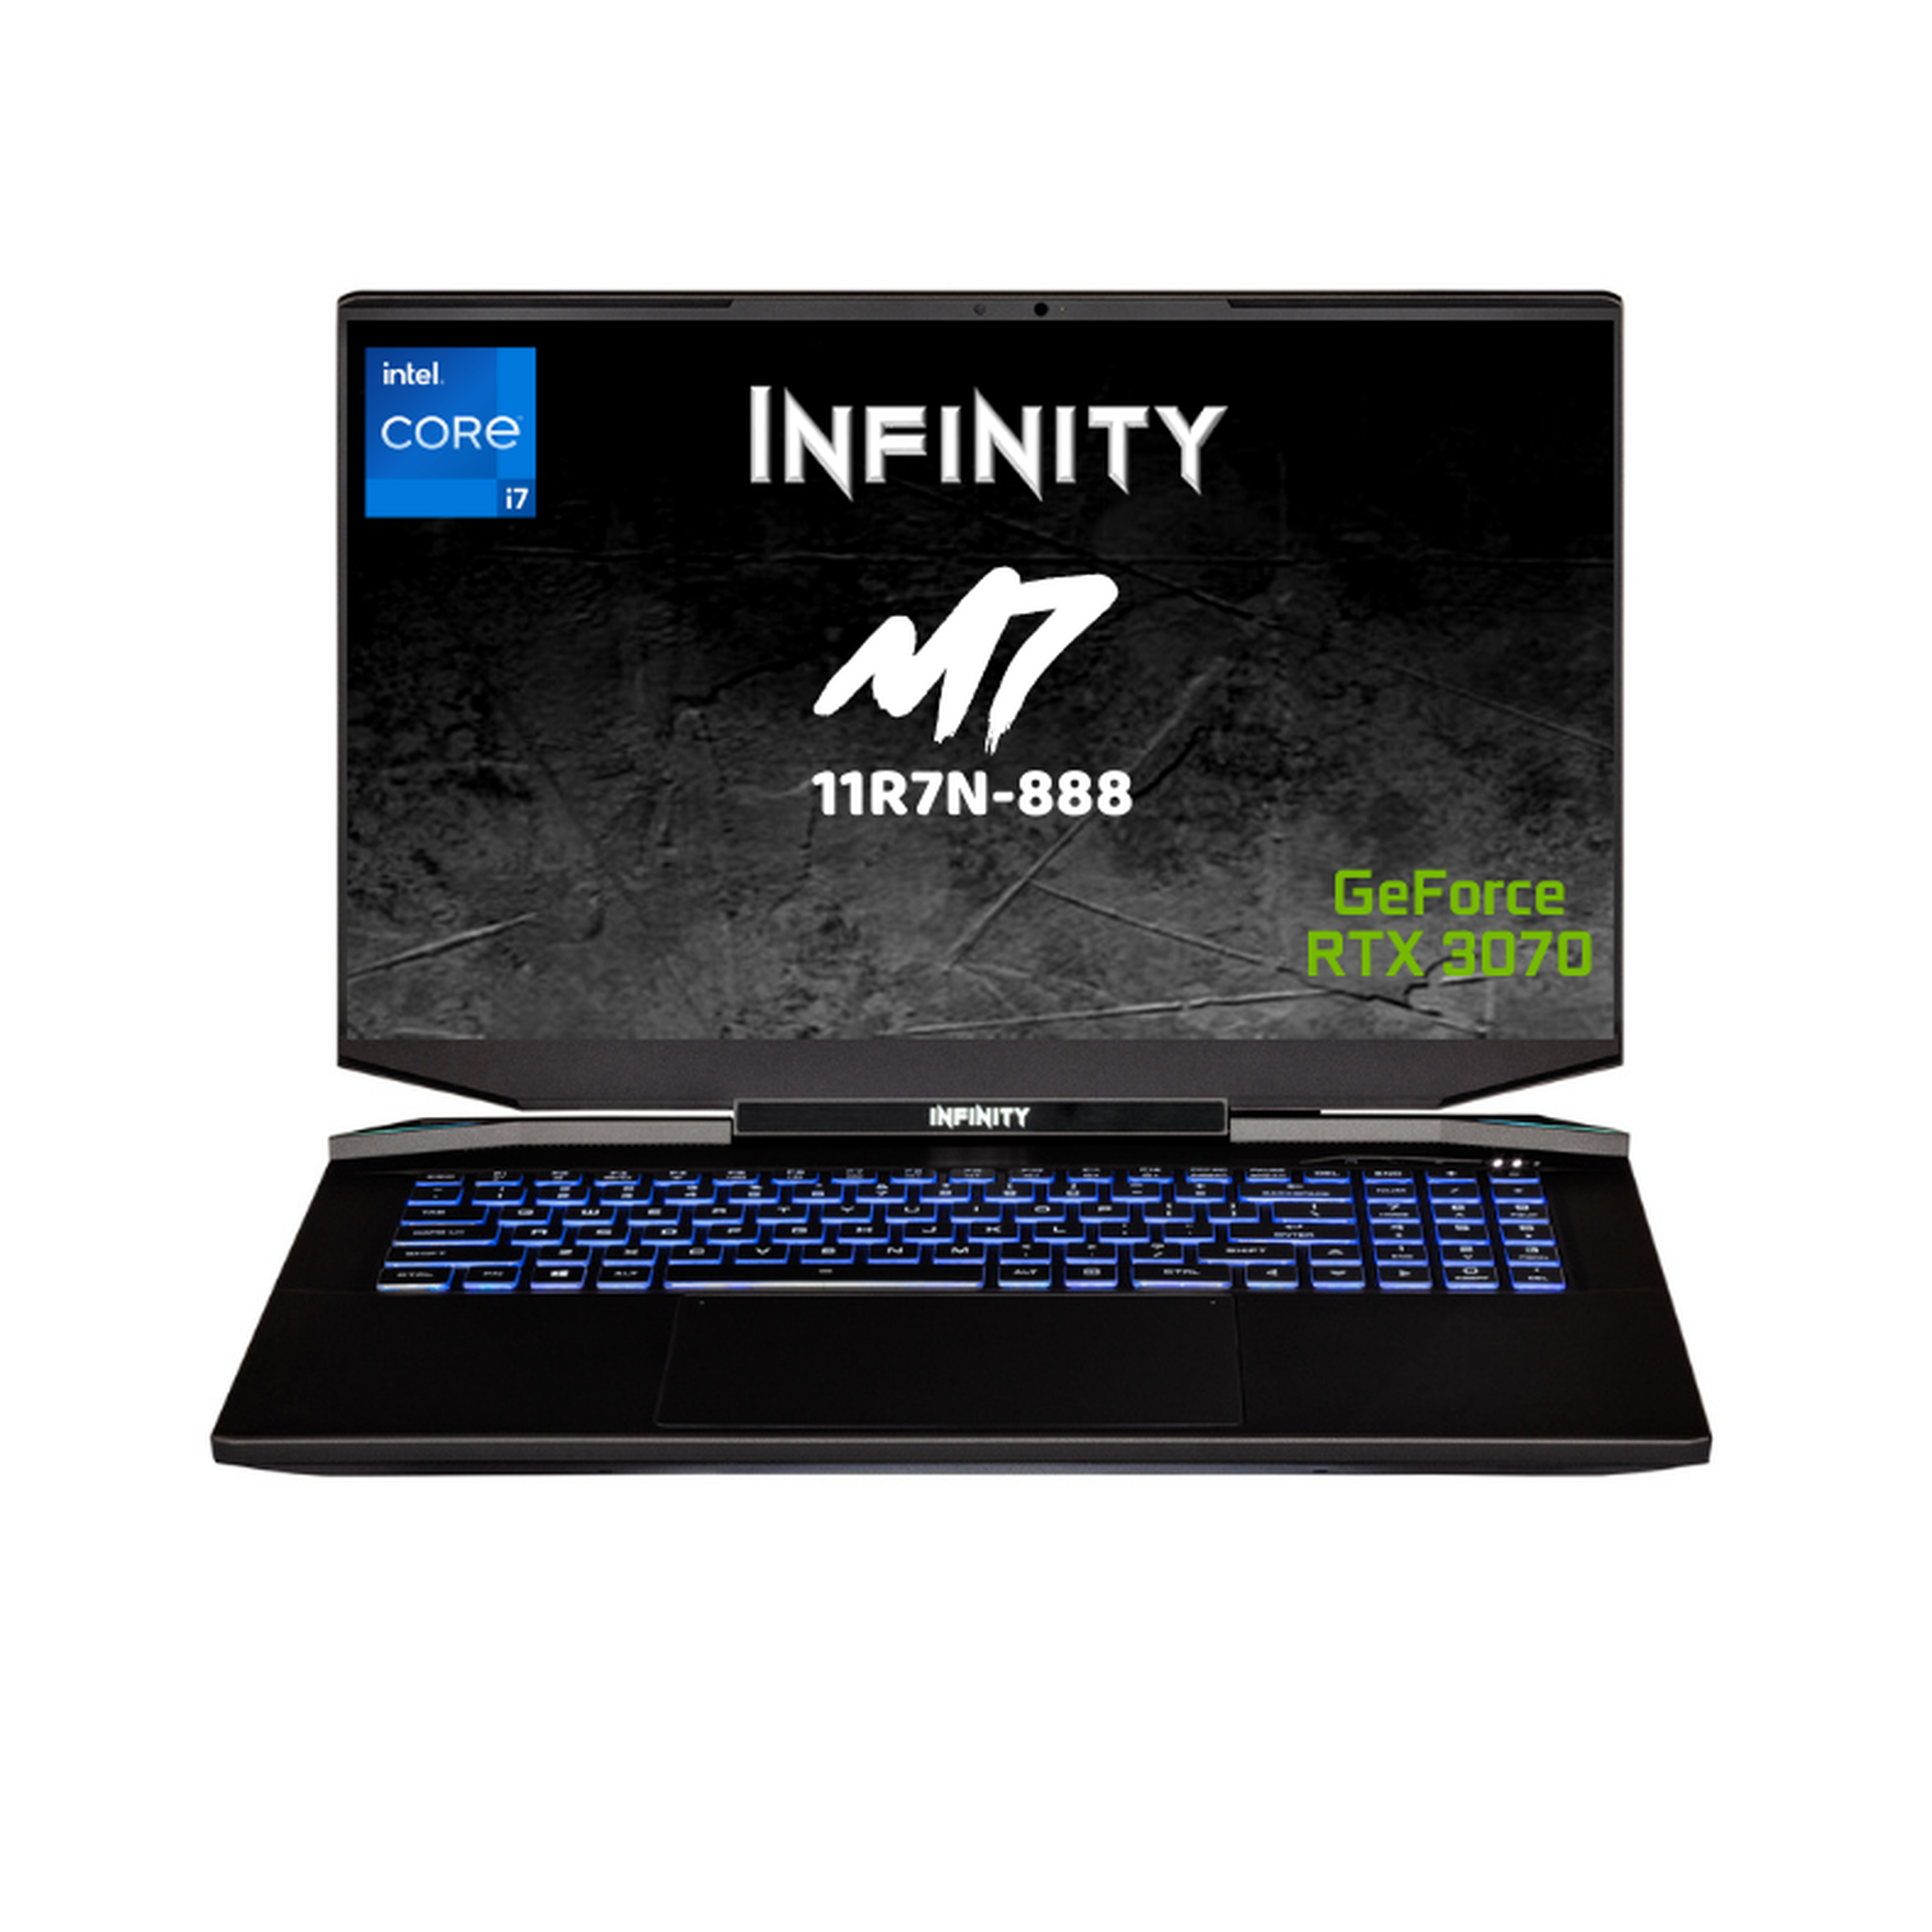 Infinity 17.3in QHD 165Hz i7-11800H RTX3070P 512GB SSD 16GB RAM W10H Gaming Laptop (M7-11R7N-888)